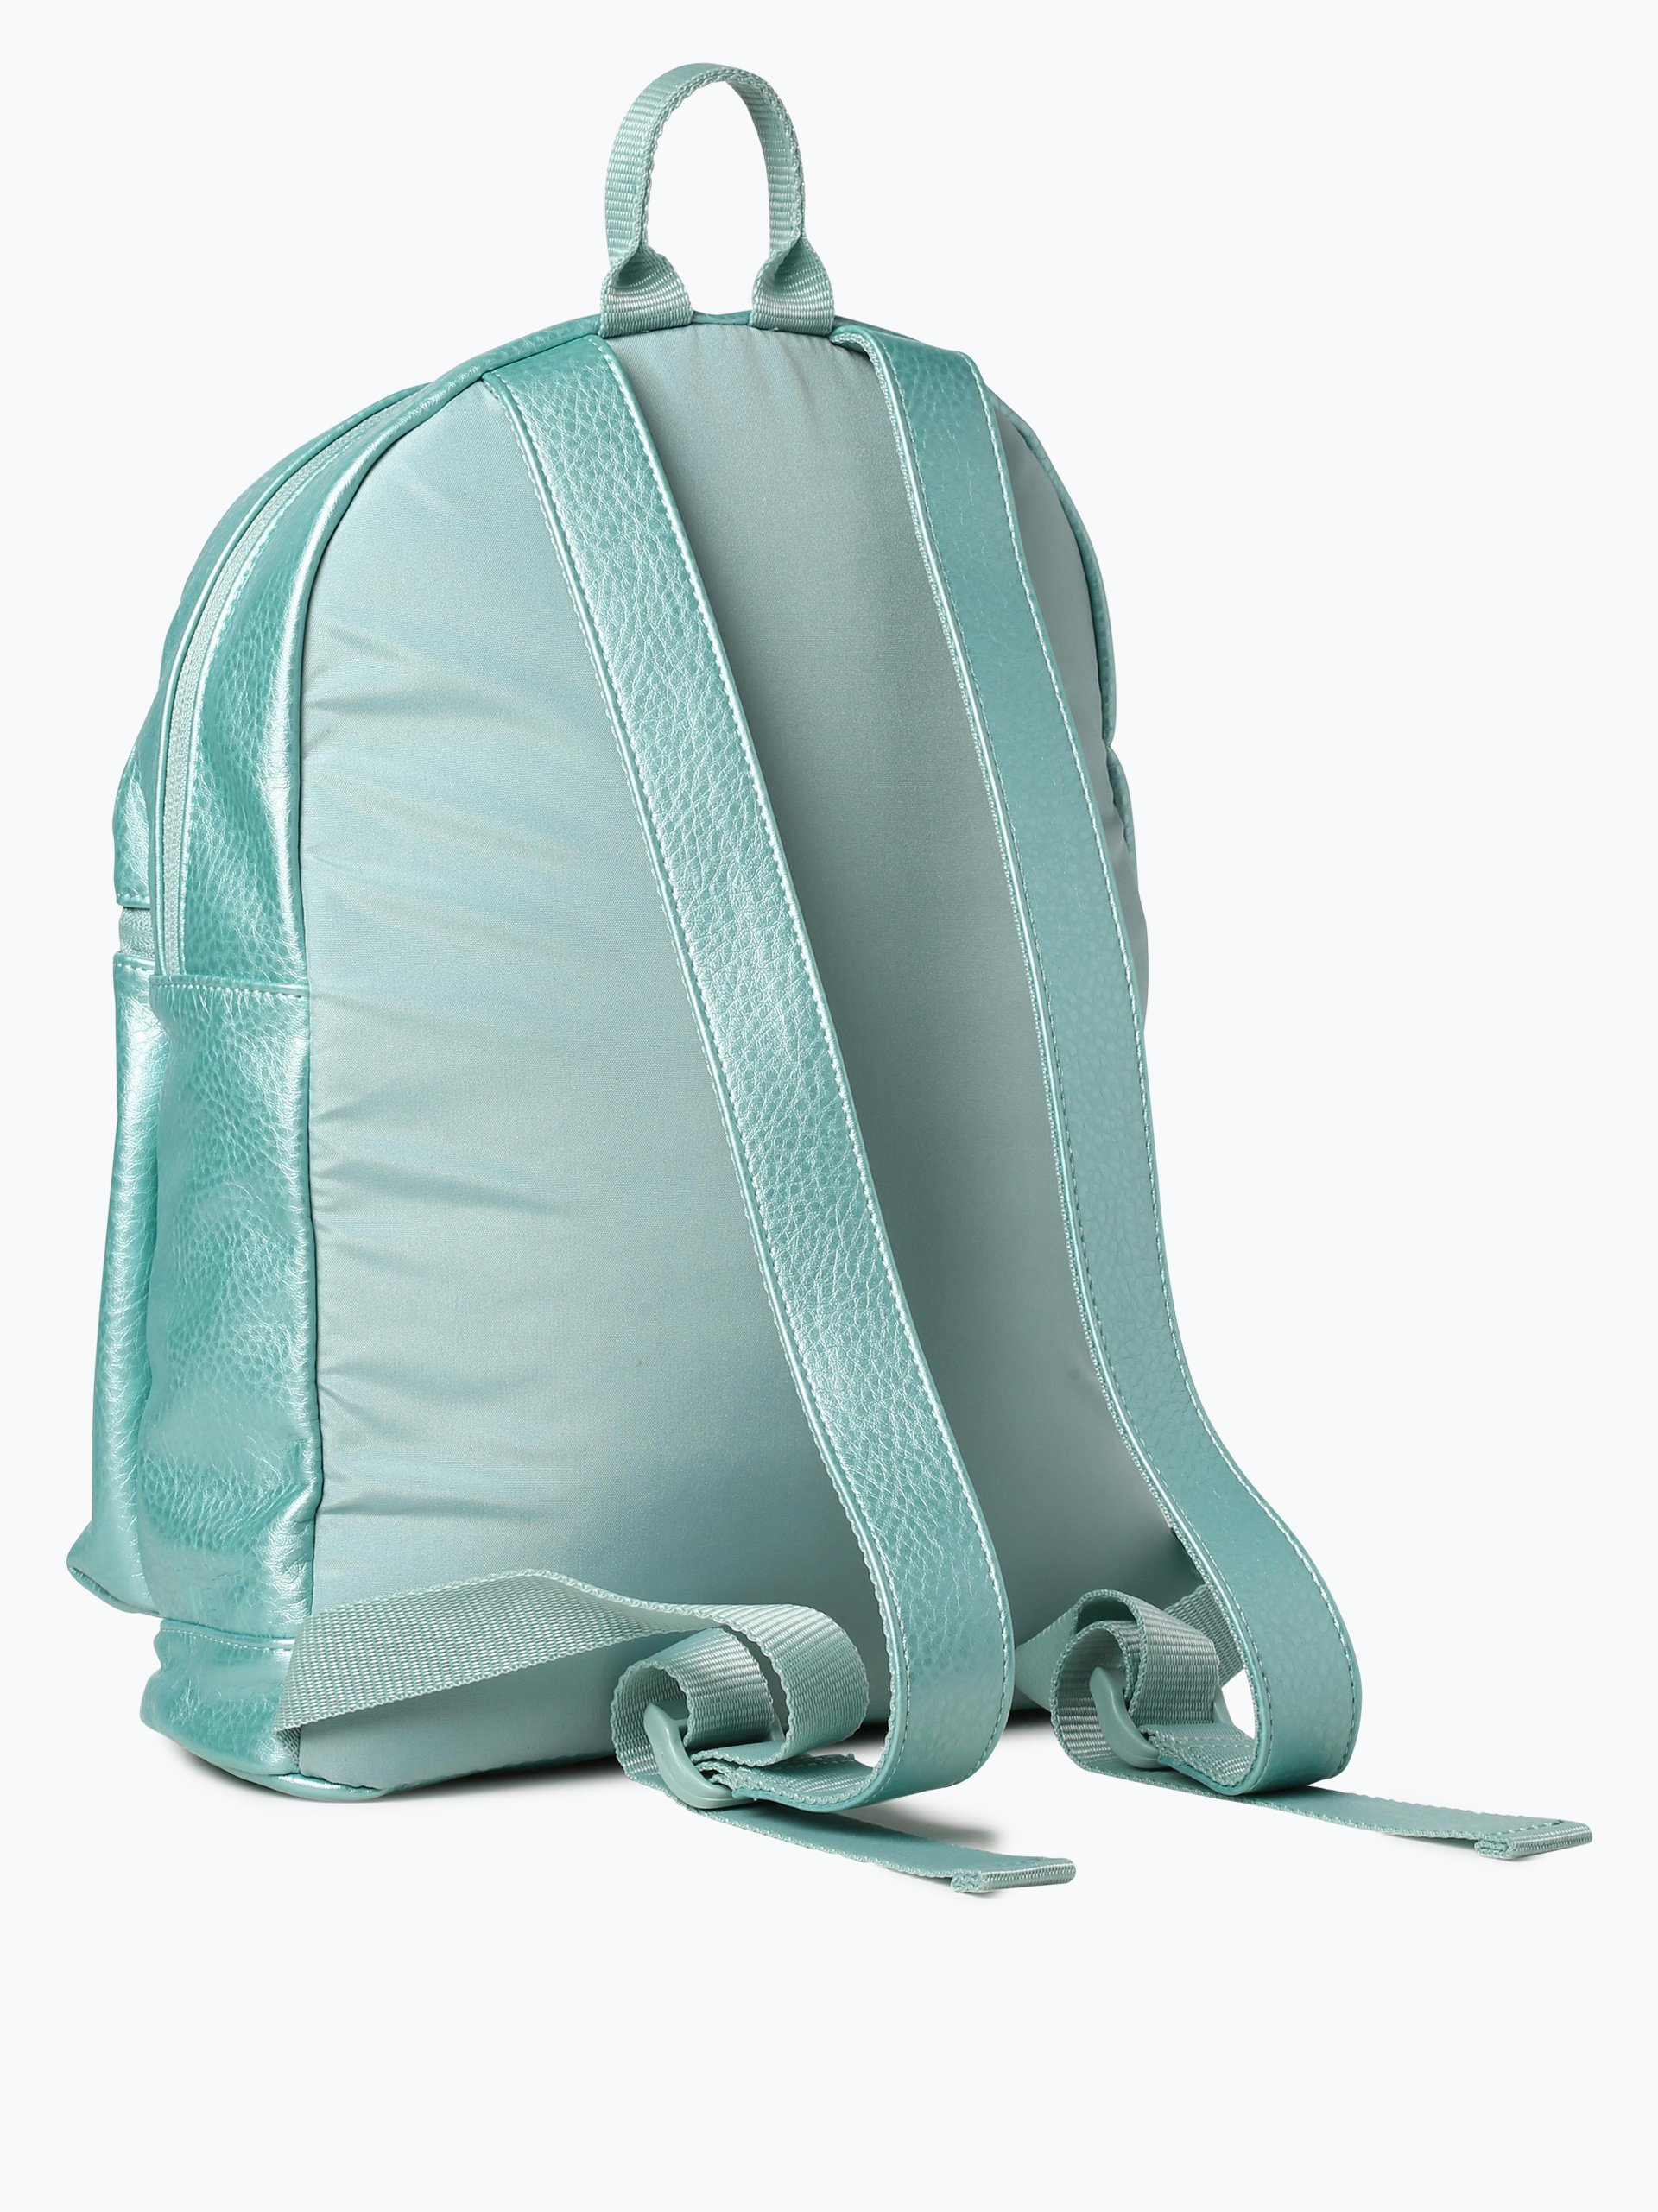 puma damen rucksack mint uni online kaufen vangraaf com. Black Bedroom Furniture Sets. Home Design Ideas